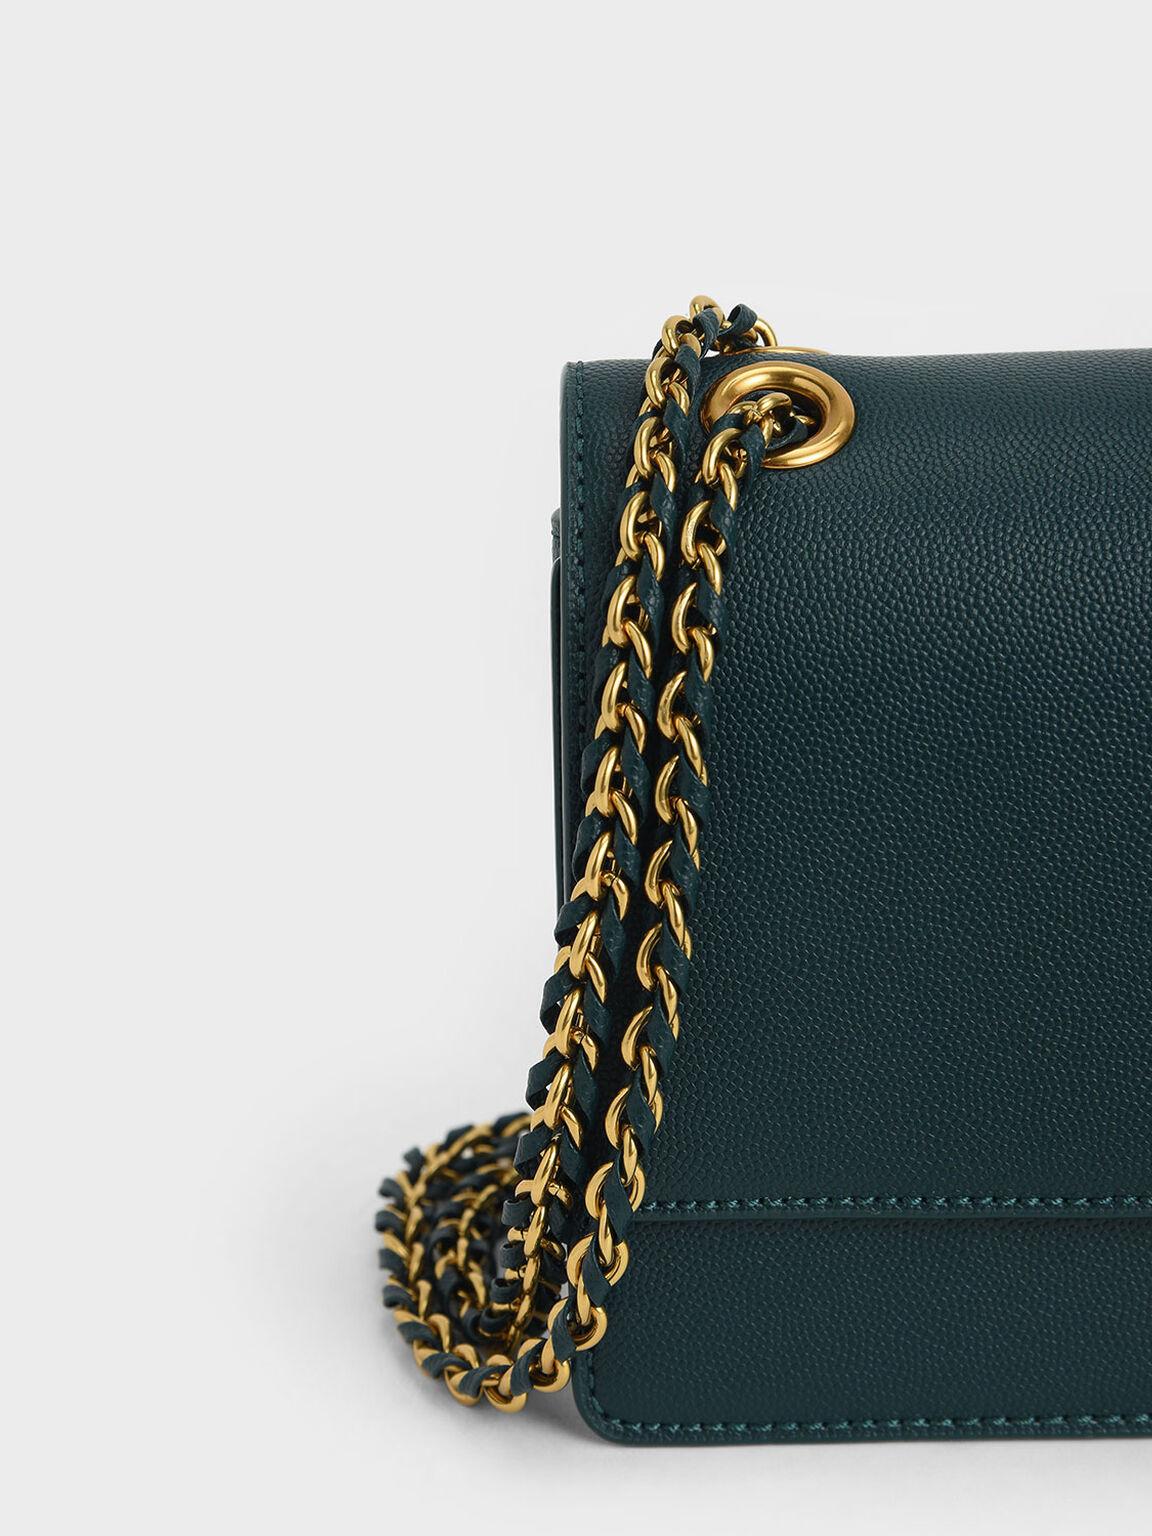 Chain Strap Push-Lock Shoulder Bag, Green, hi-res